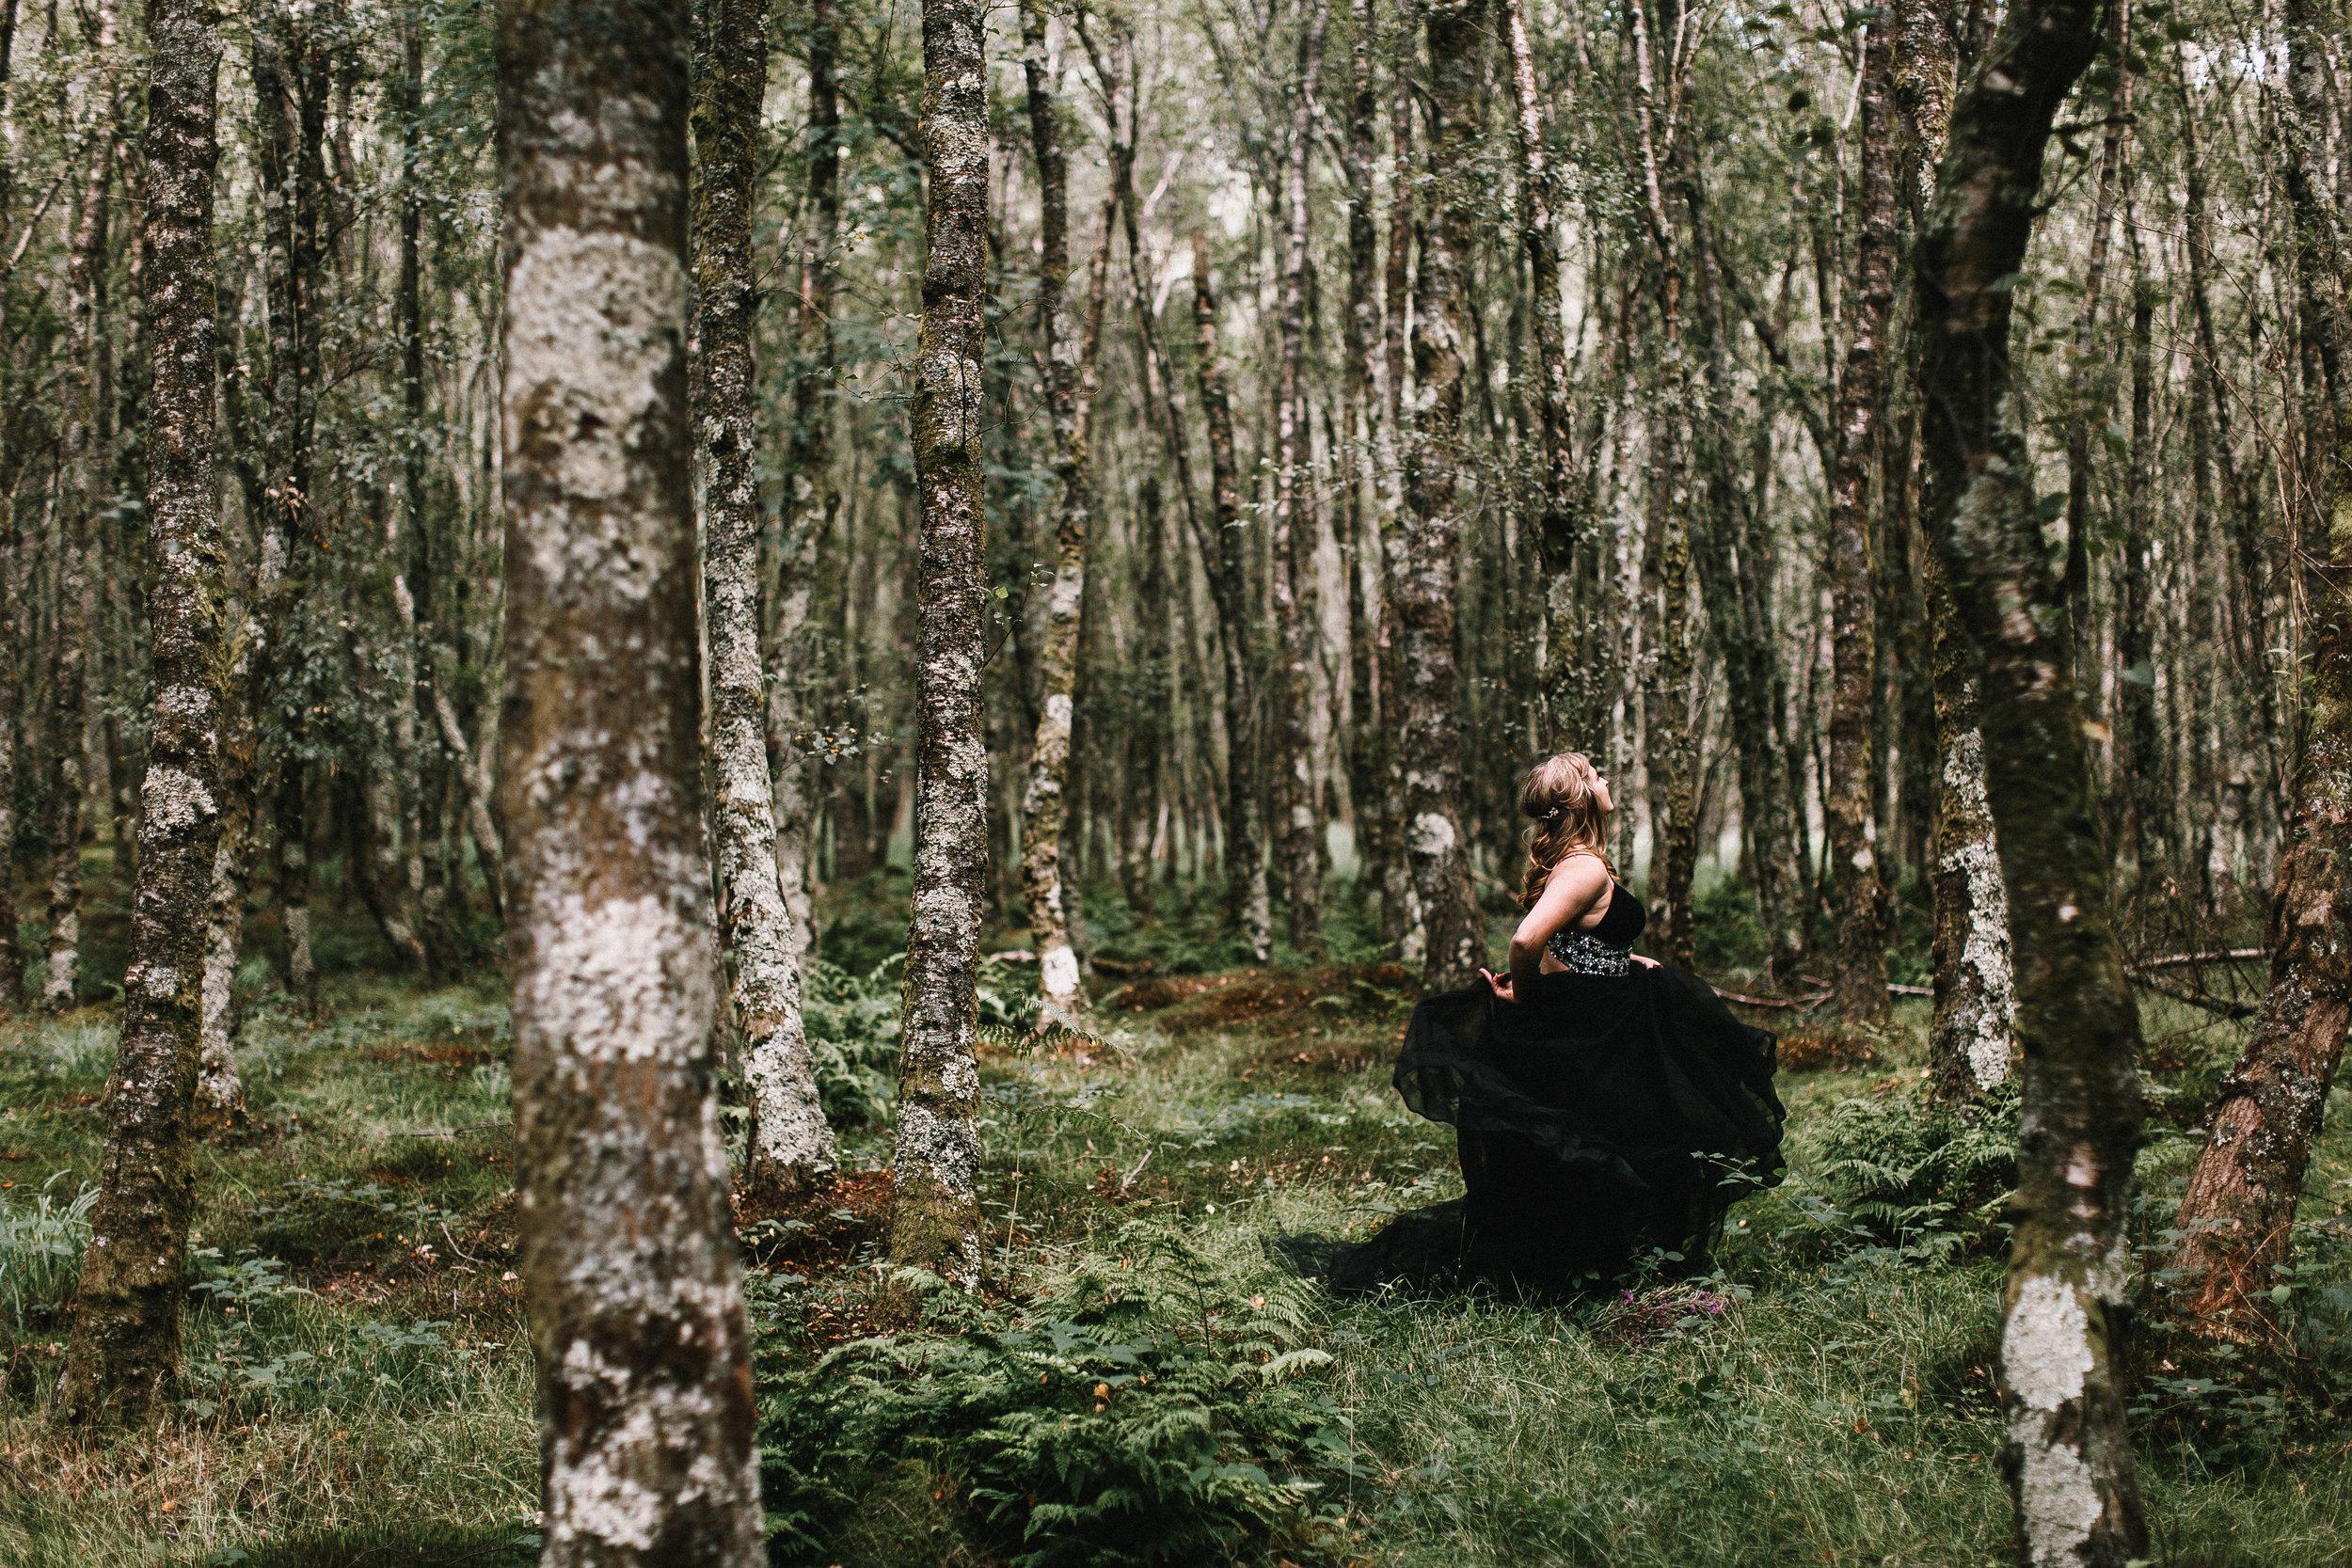 ireland_elopement_black_wedding_dress_wicklow_glendalough_athy_st_kevins_way_1530.jpg